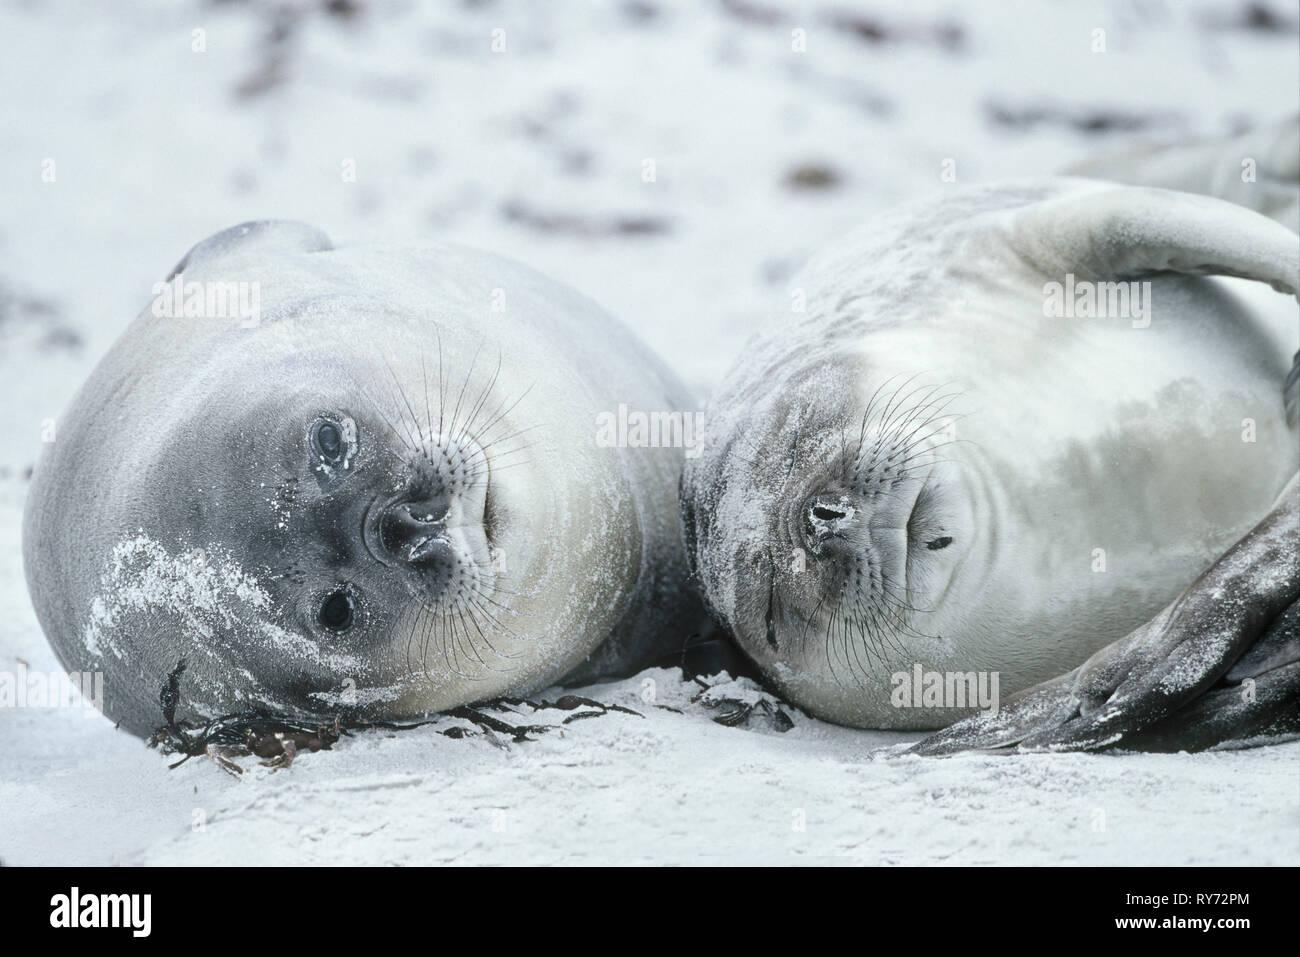 Southern Elephant Seal pups (Mirounga leonina) enjoyng the beach, Falkland Islands, South Atalantic, South America - Stock Image